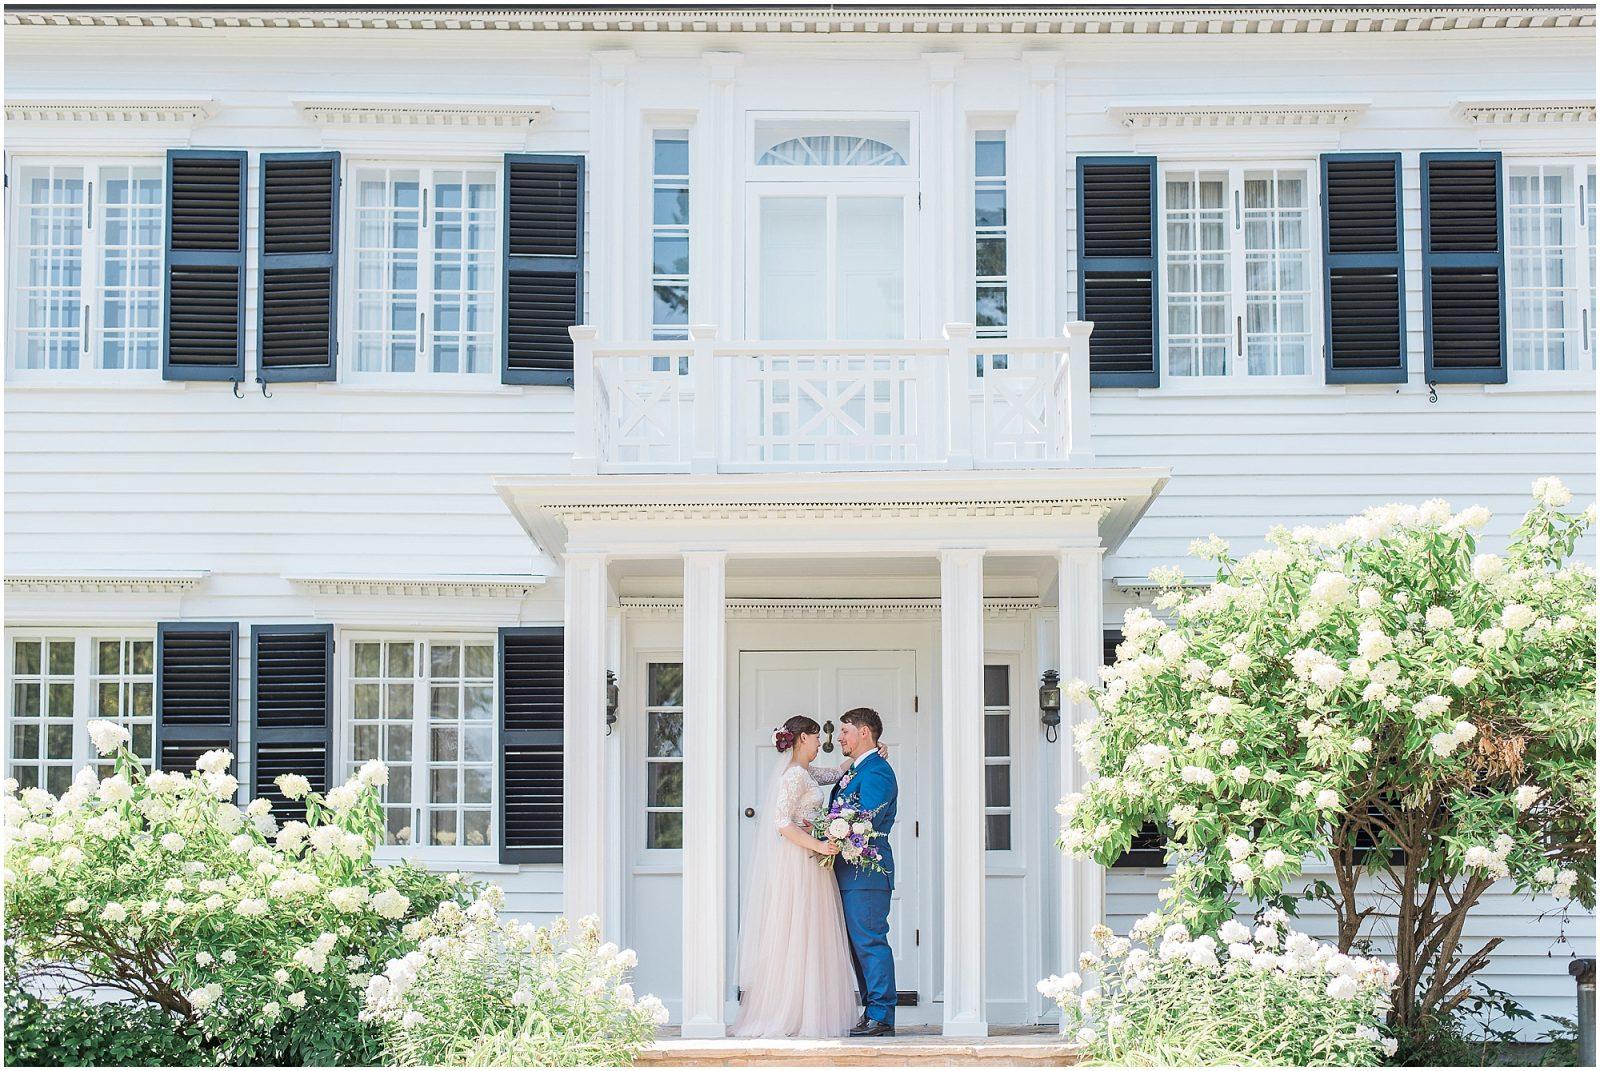 billings estate wedding ottawa